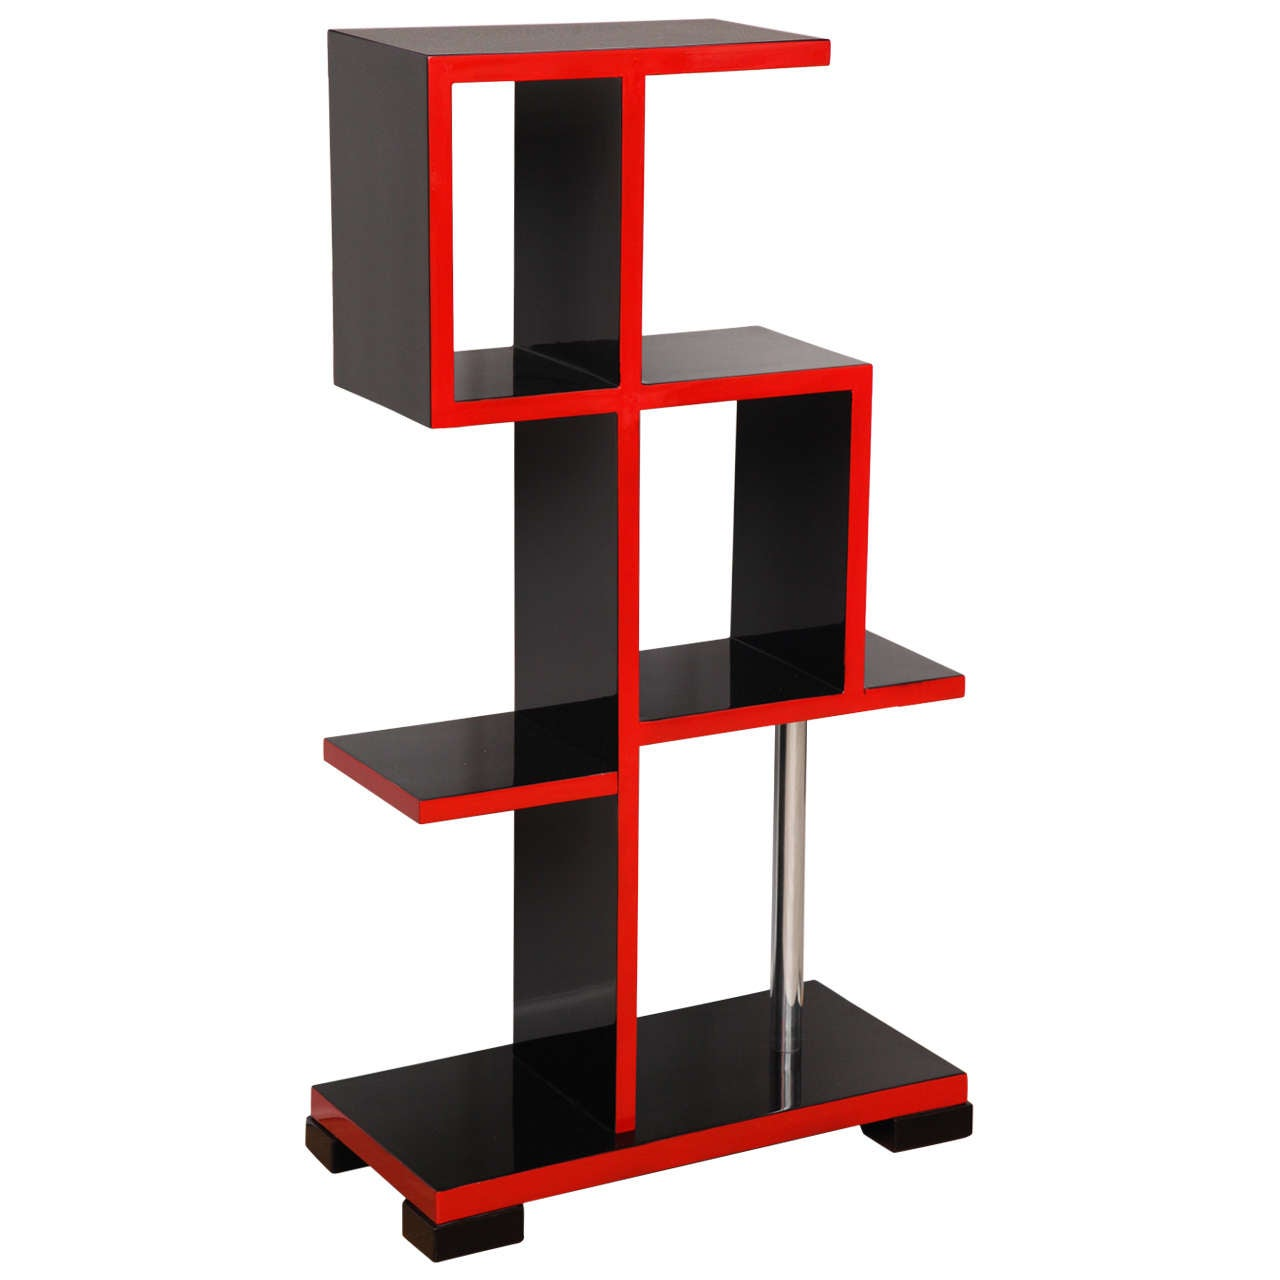 rare bauhaus etagere bookcase at 1stdibs. Black Bedroom Furniture Sets. Home Design Ideas